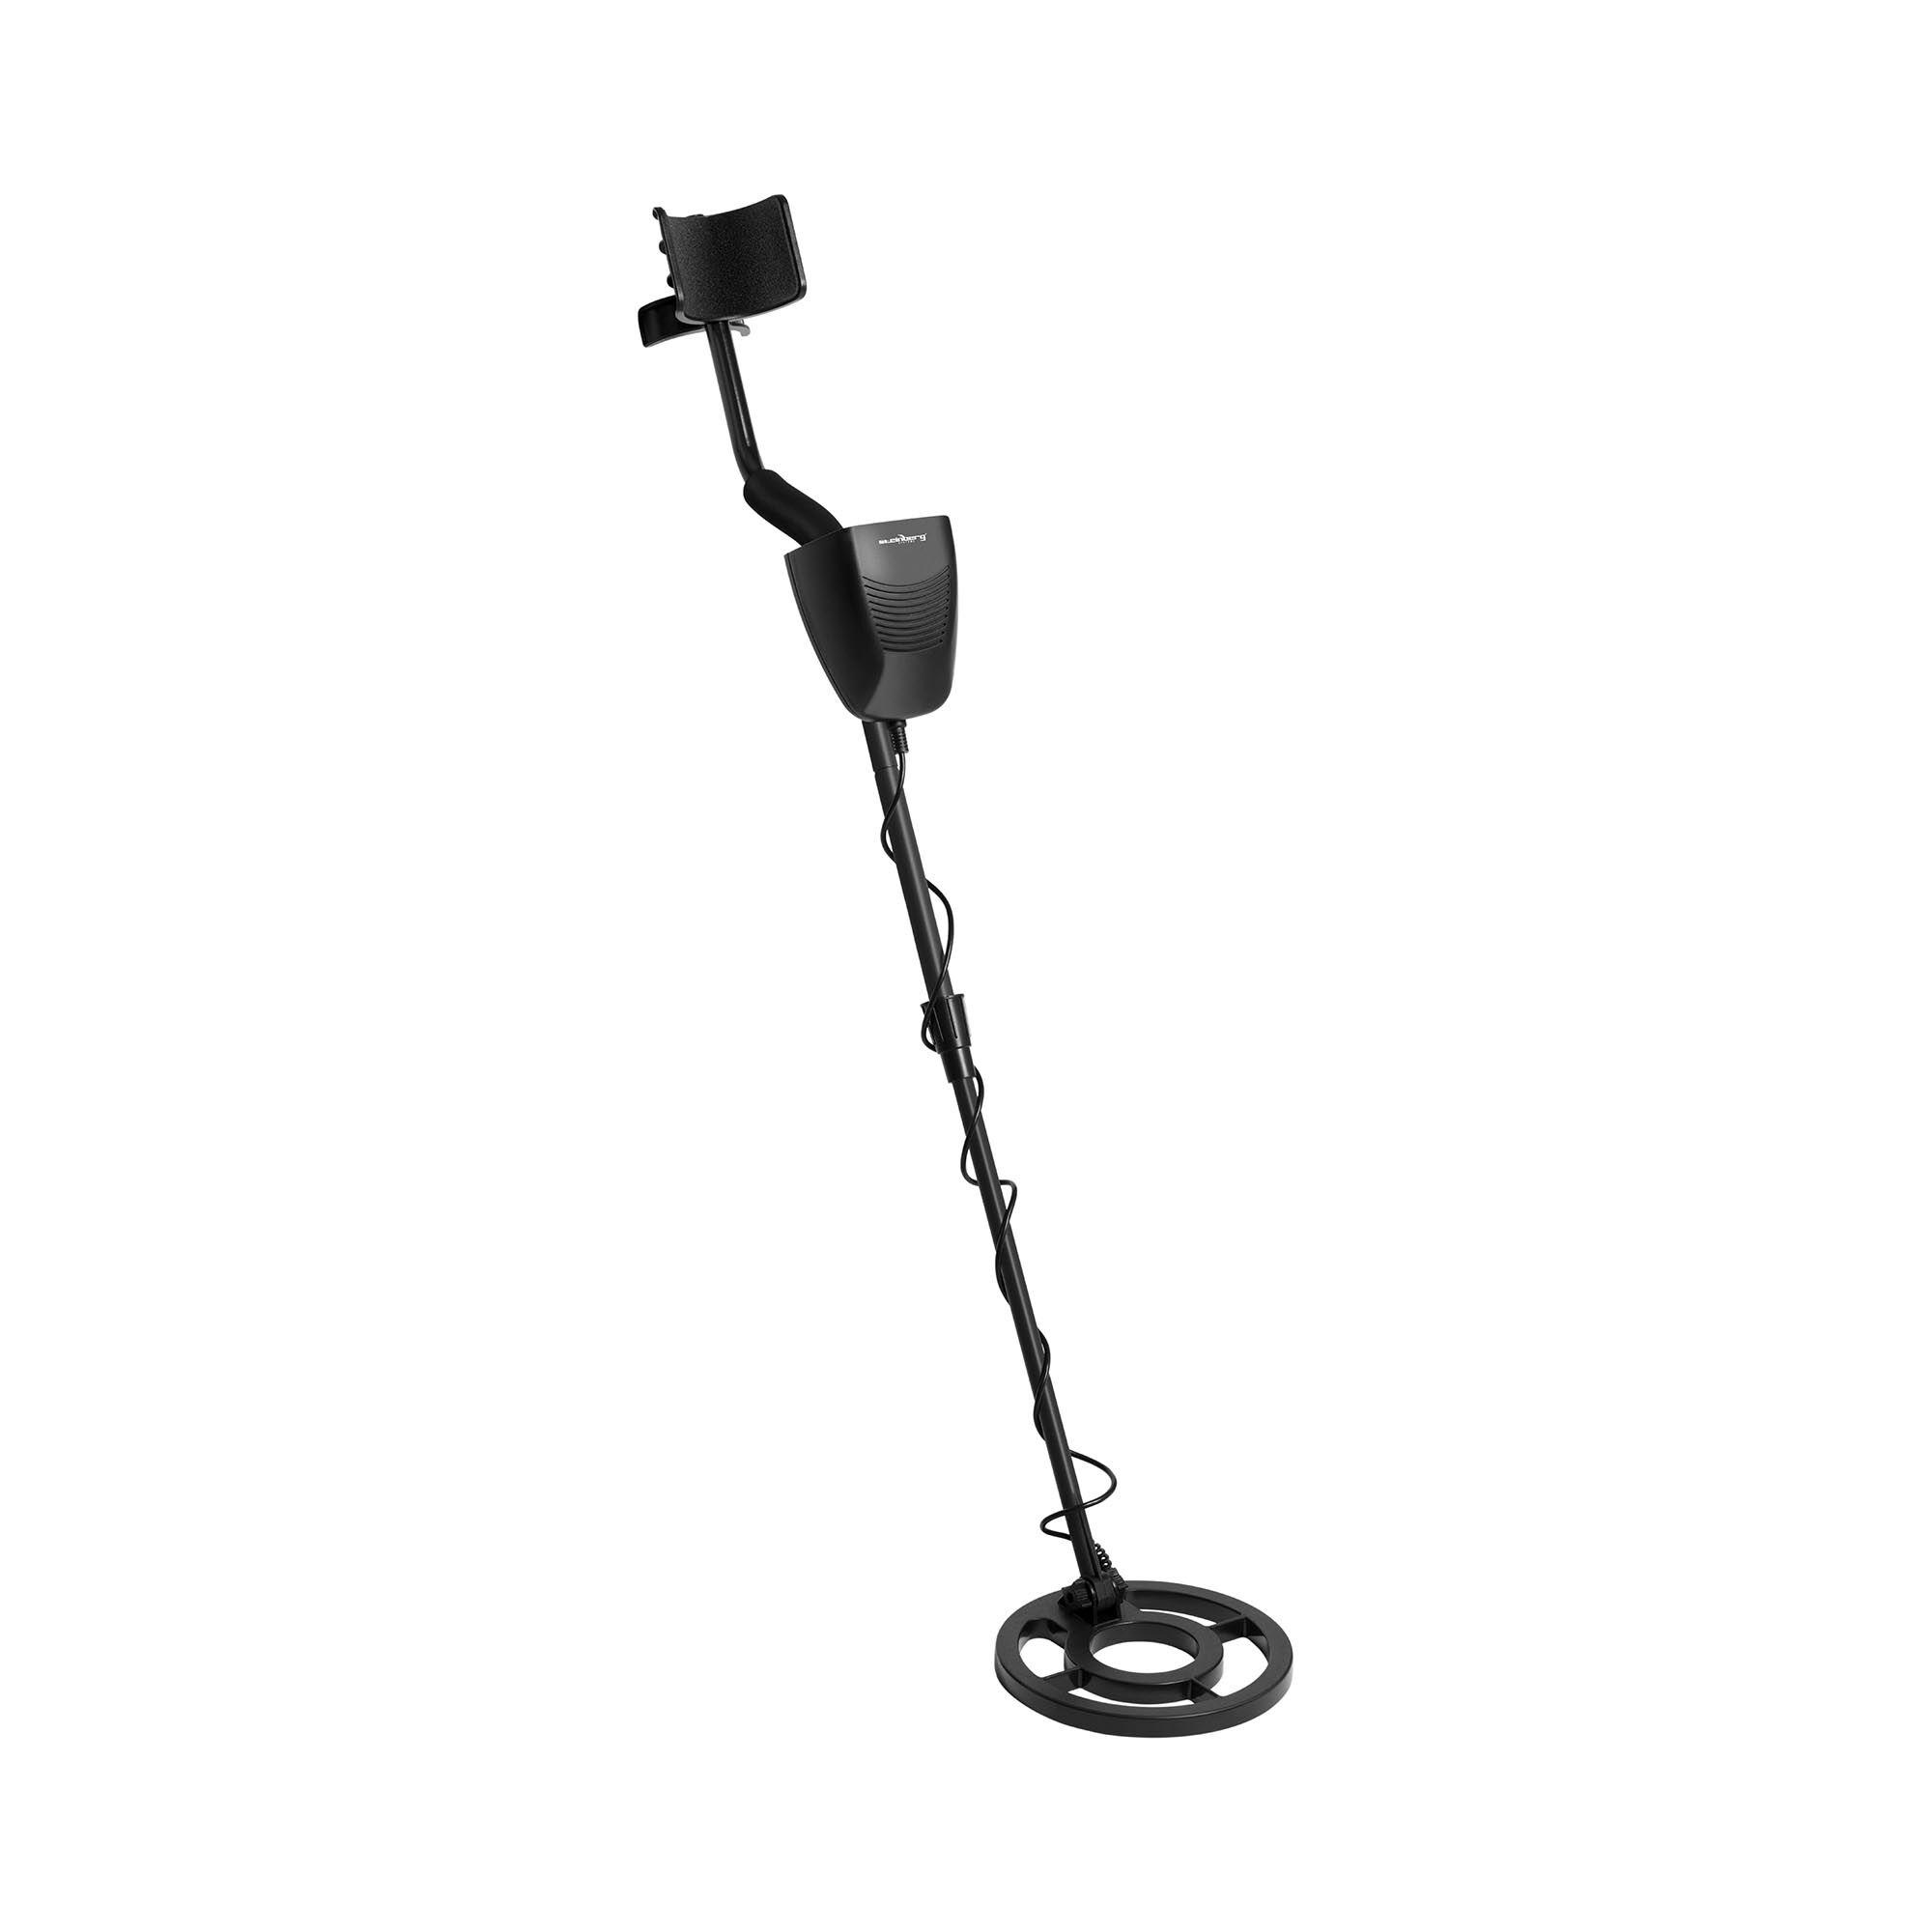 Steinberg Metal detector professionale di profondità - 100 cm / 16 cm - Ø 21,5 cm SBS-MD-14